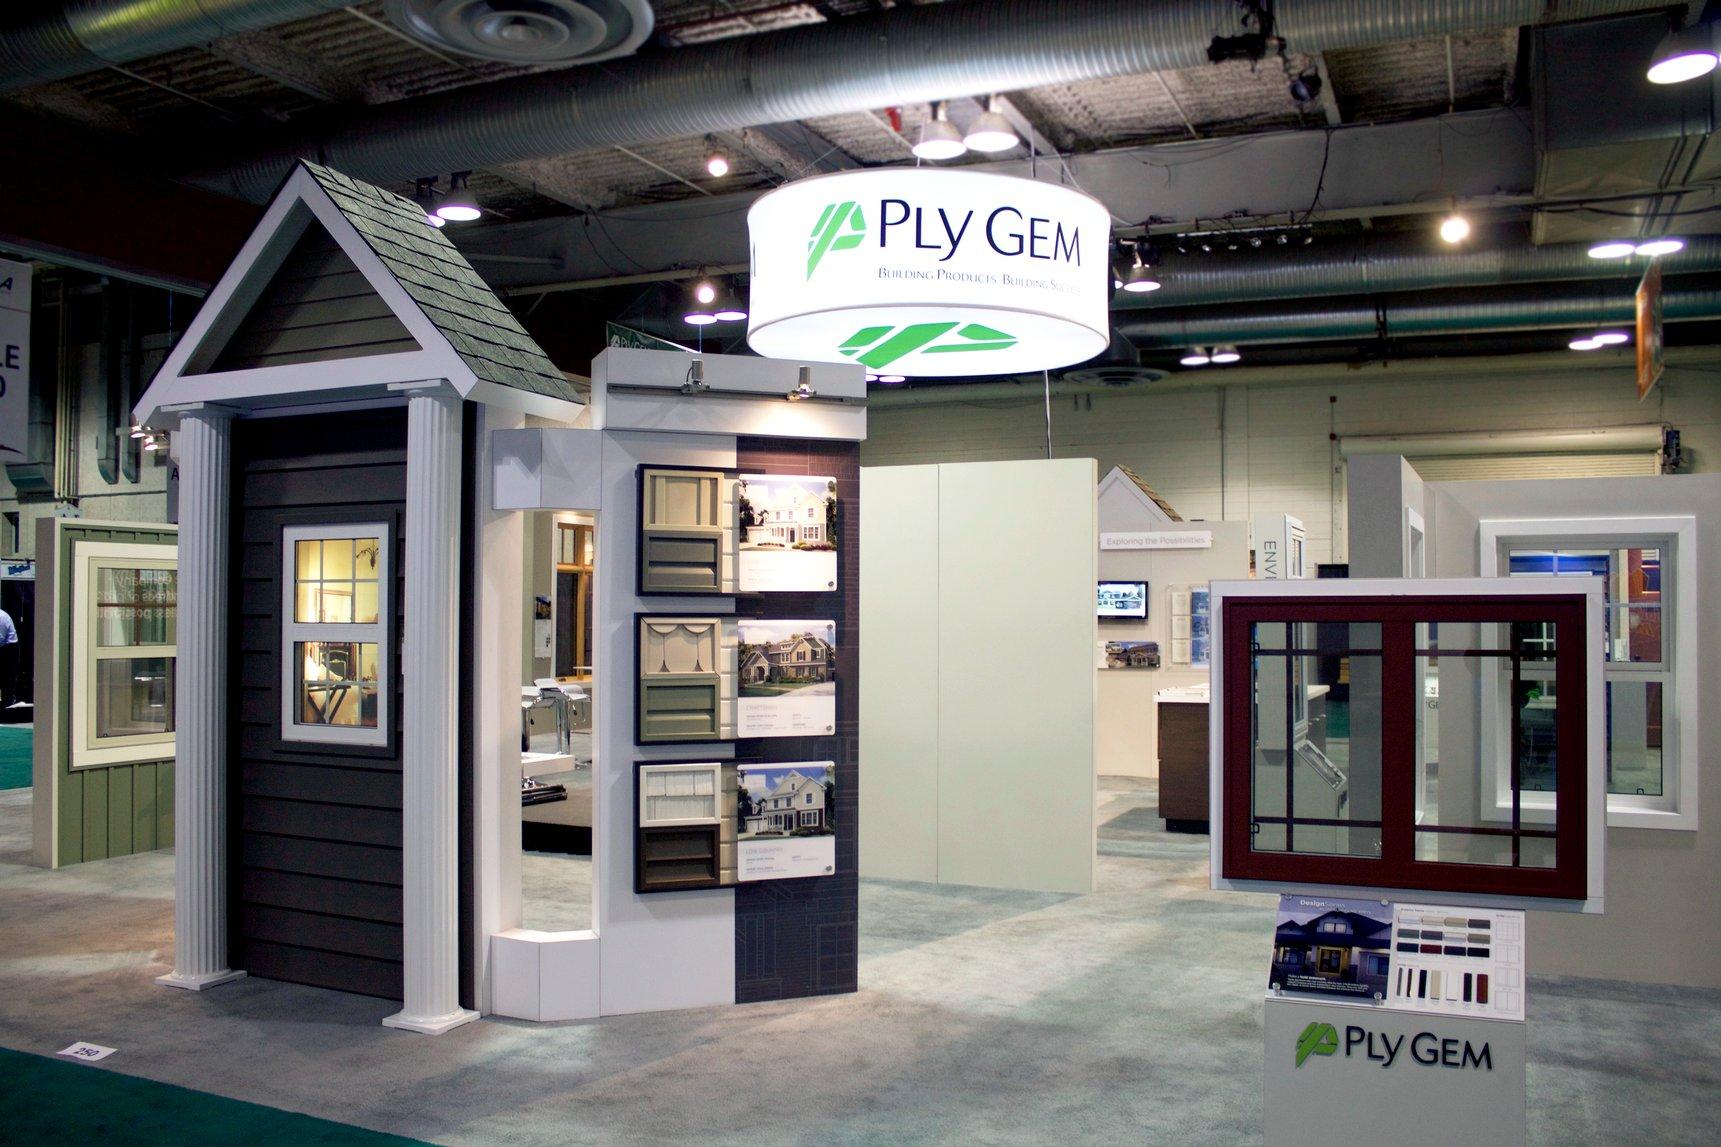 Custom 30x50 exhibit with custom builds for Ply Gem Canada.